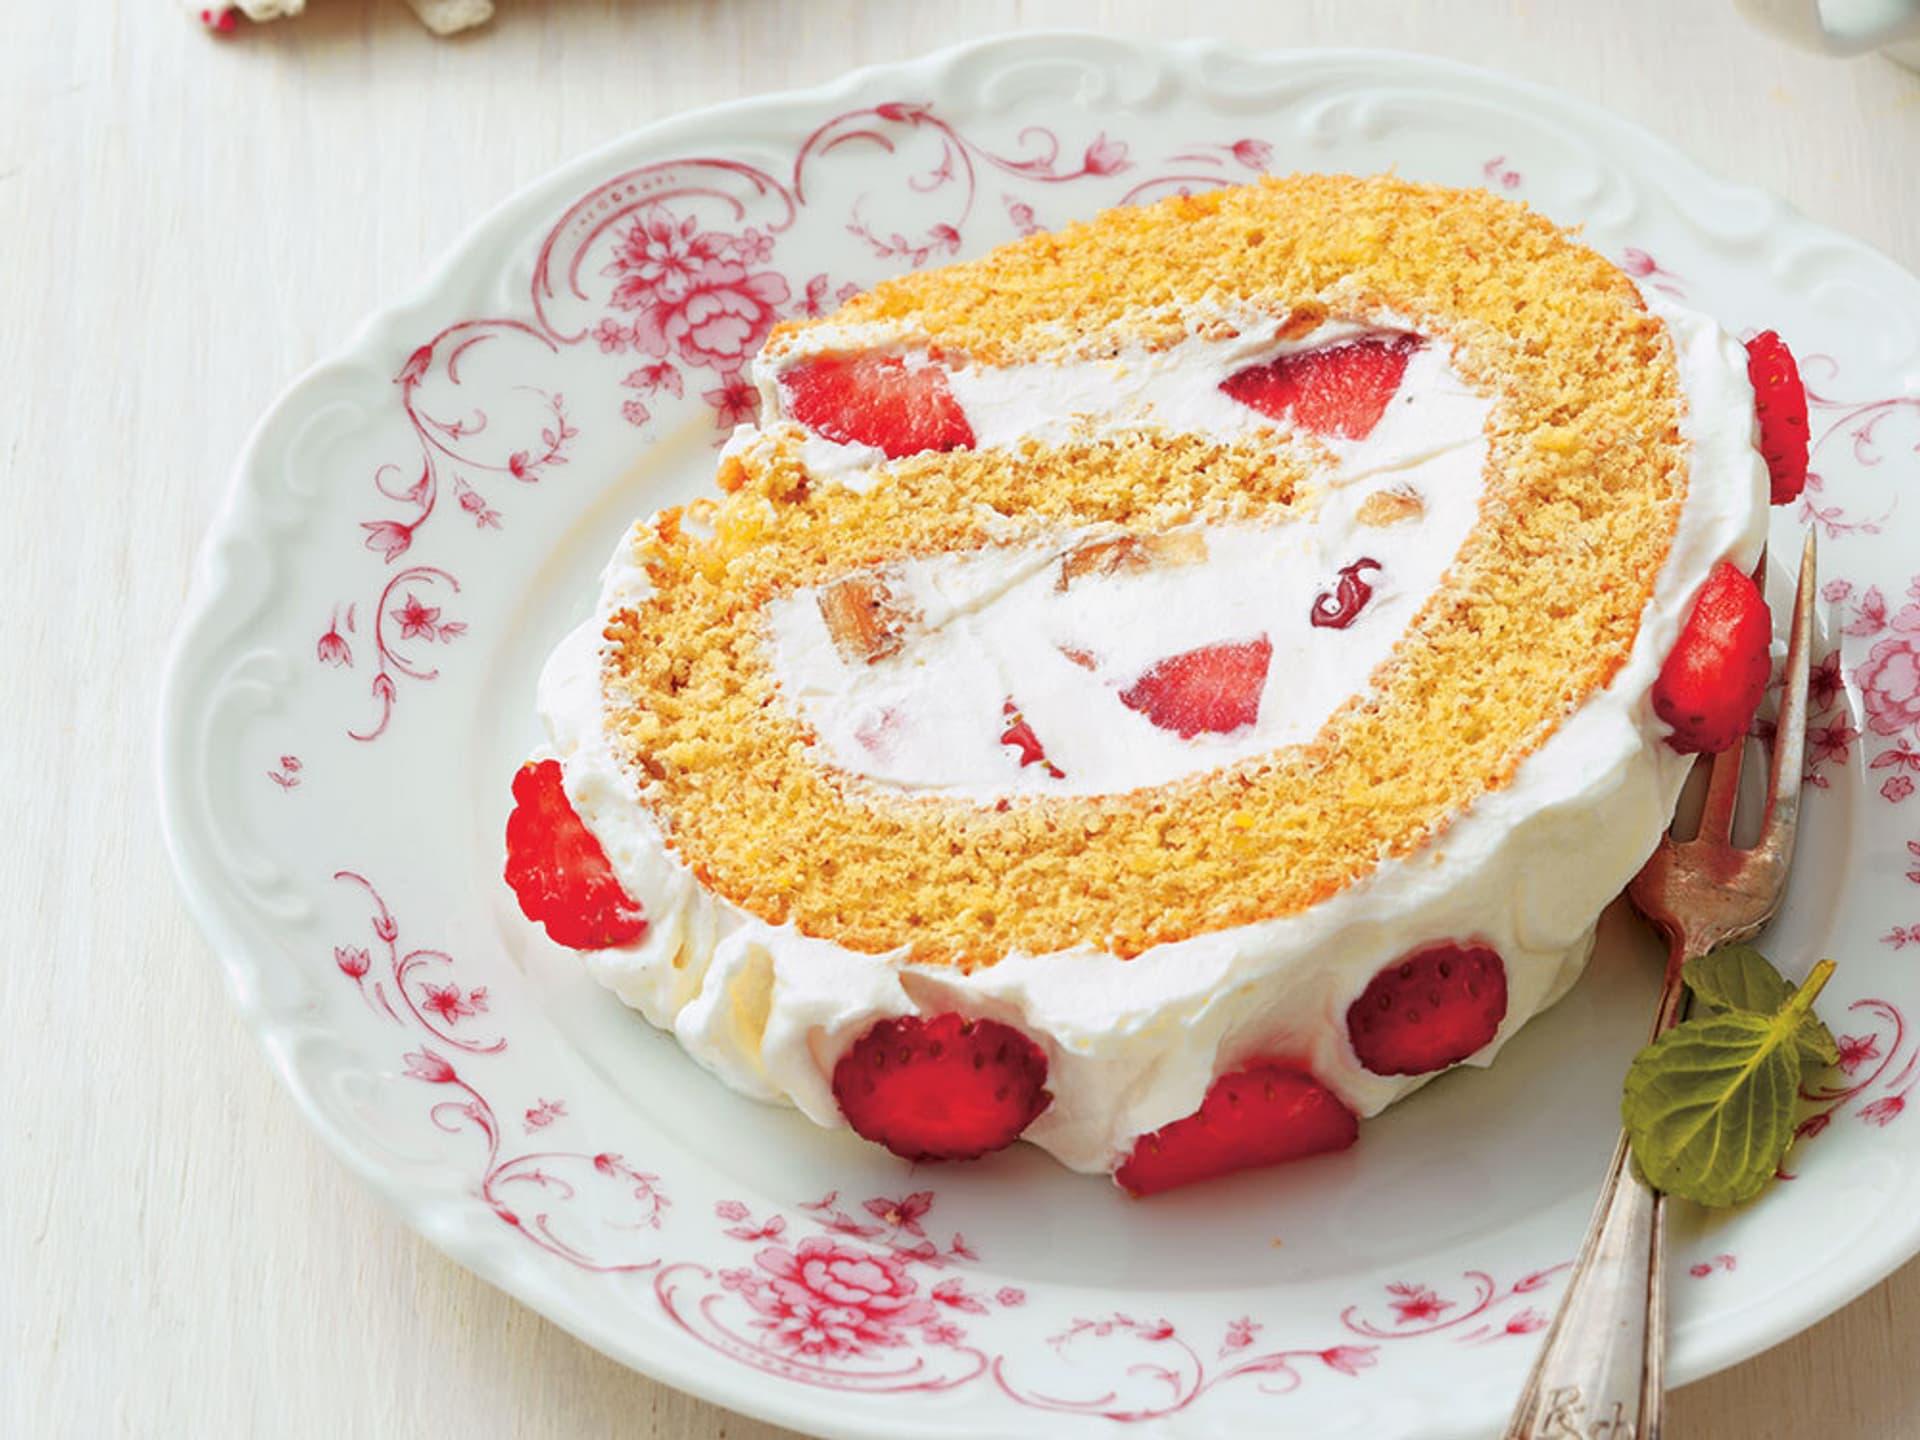 Mandelrolle mit Erdbeer-Bananen-Creme